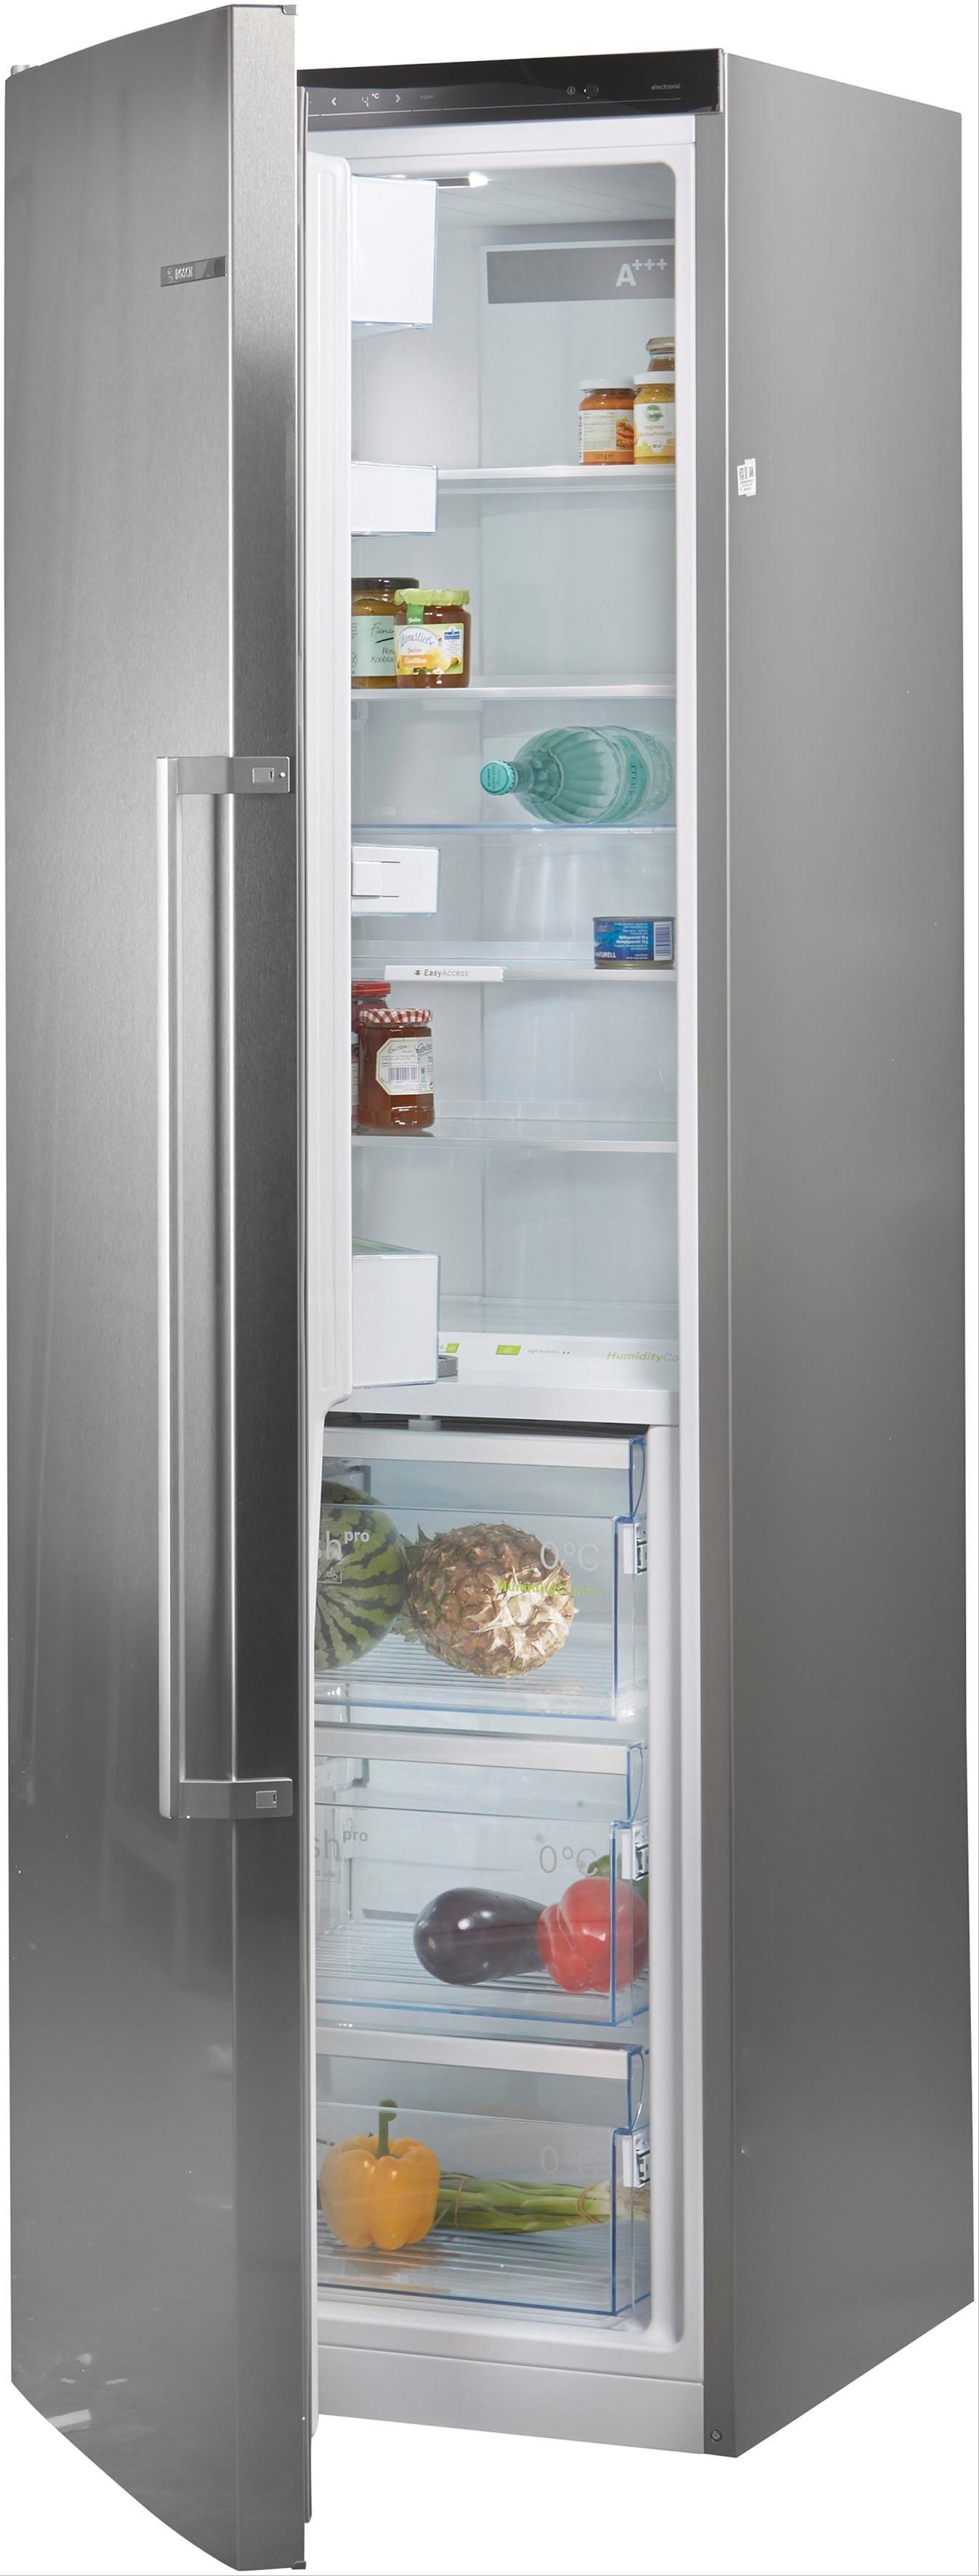 Bosch koelkast serie 8, 186 cm hoog, 60 cm breed - verschillende betaalmethodes